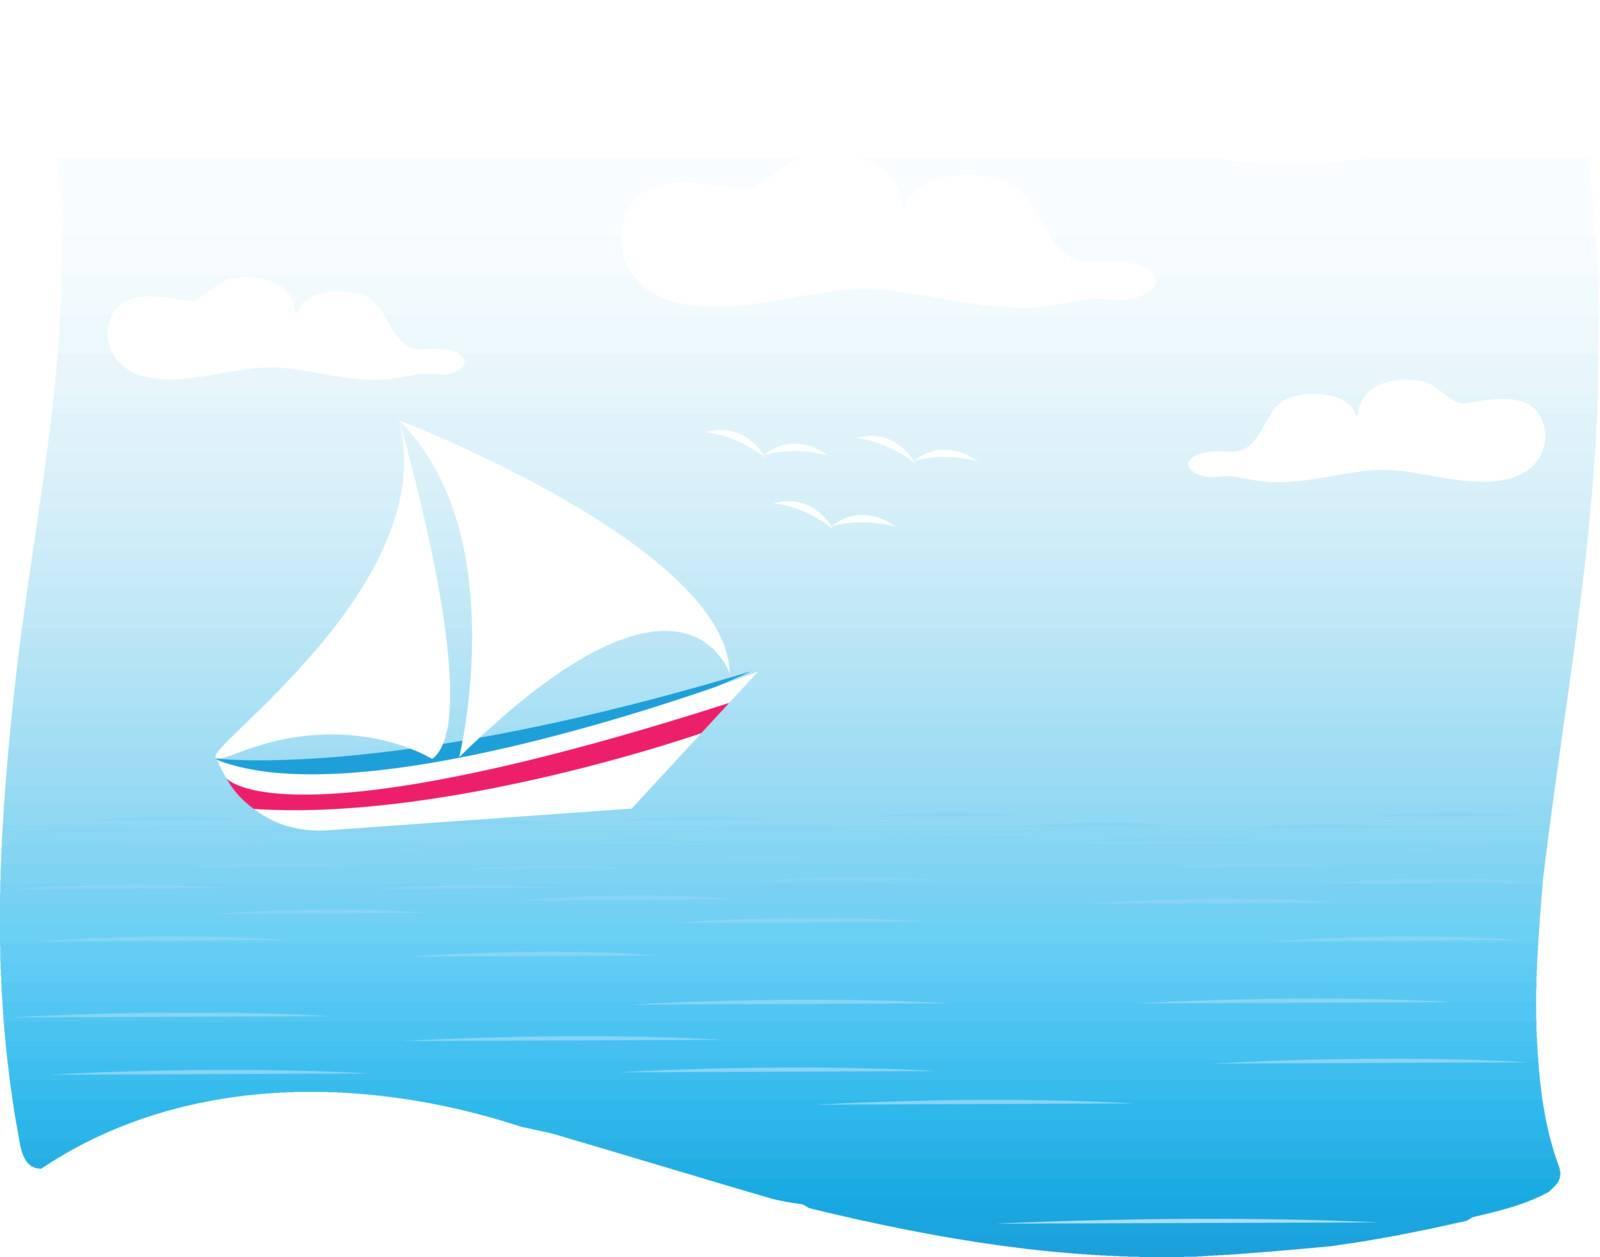 sea and yachts